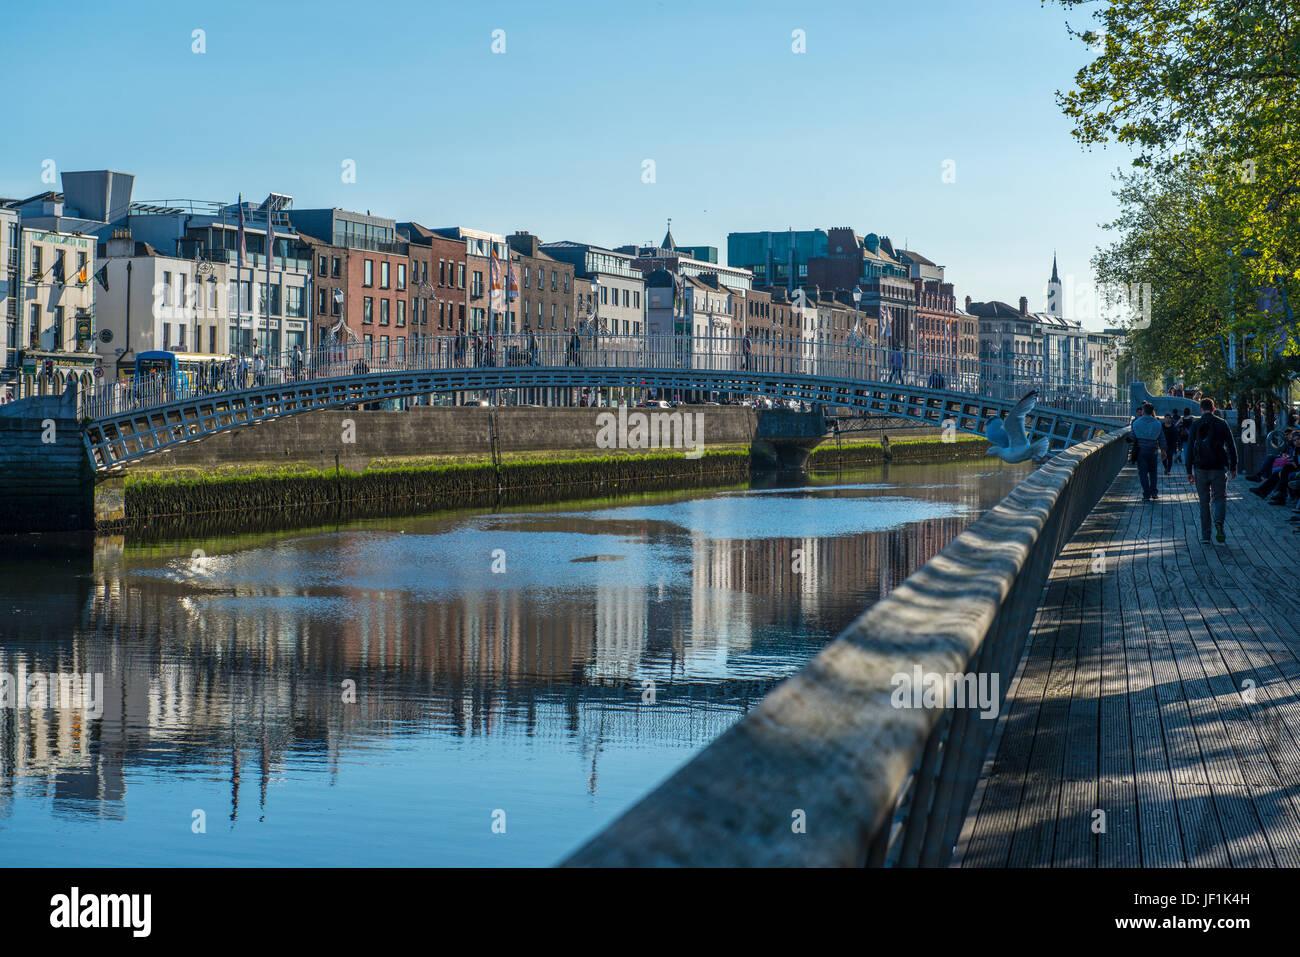 Ha'penny Bridge, Halfpenny Bridge, officially Liffey Bridge, Dublin, Ireland - Stock Image